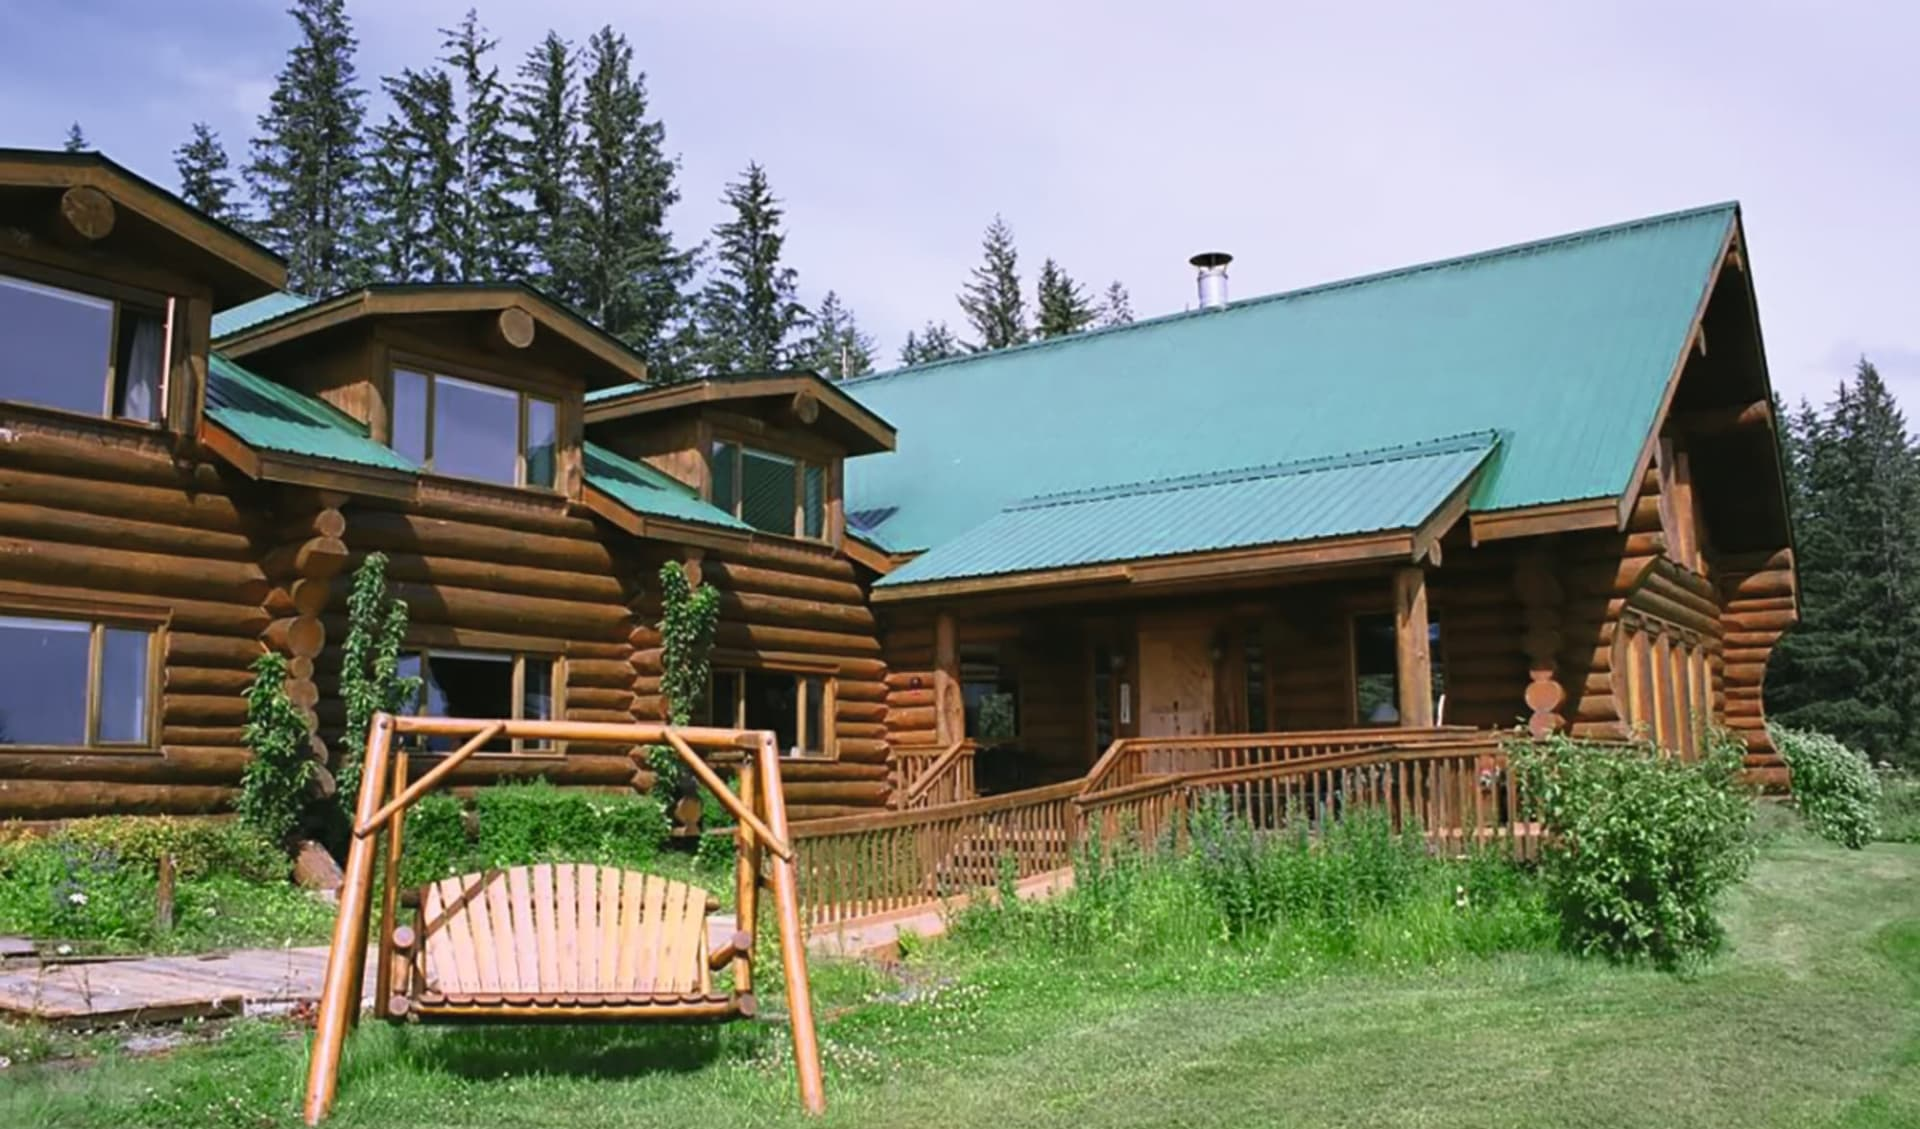 Bear Track Inn in Glacier Bay National Park:  Bear Track Inn